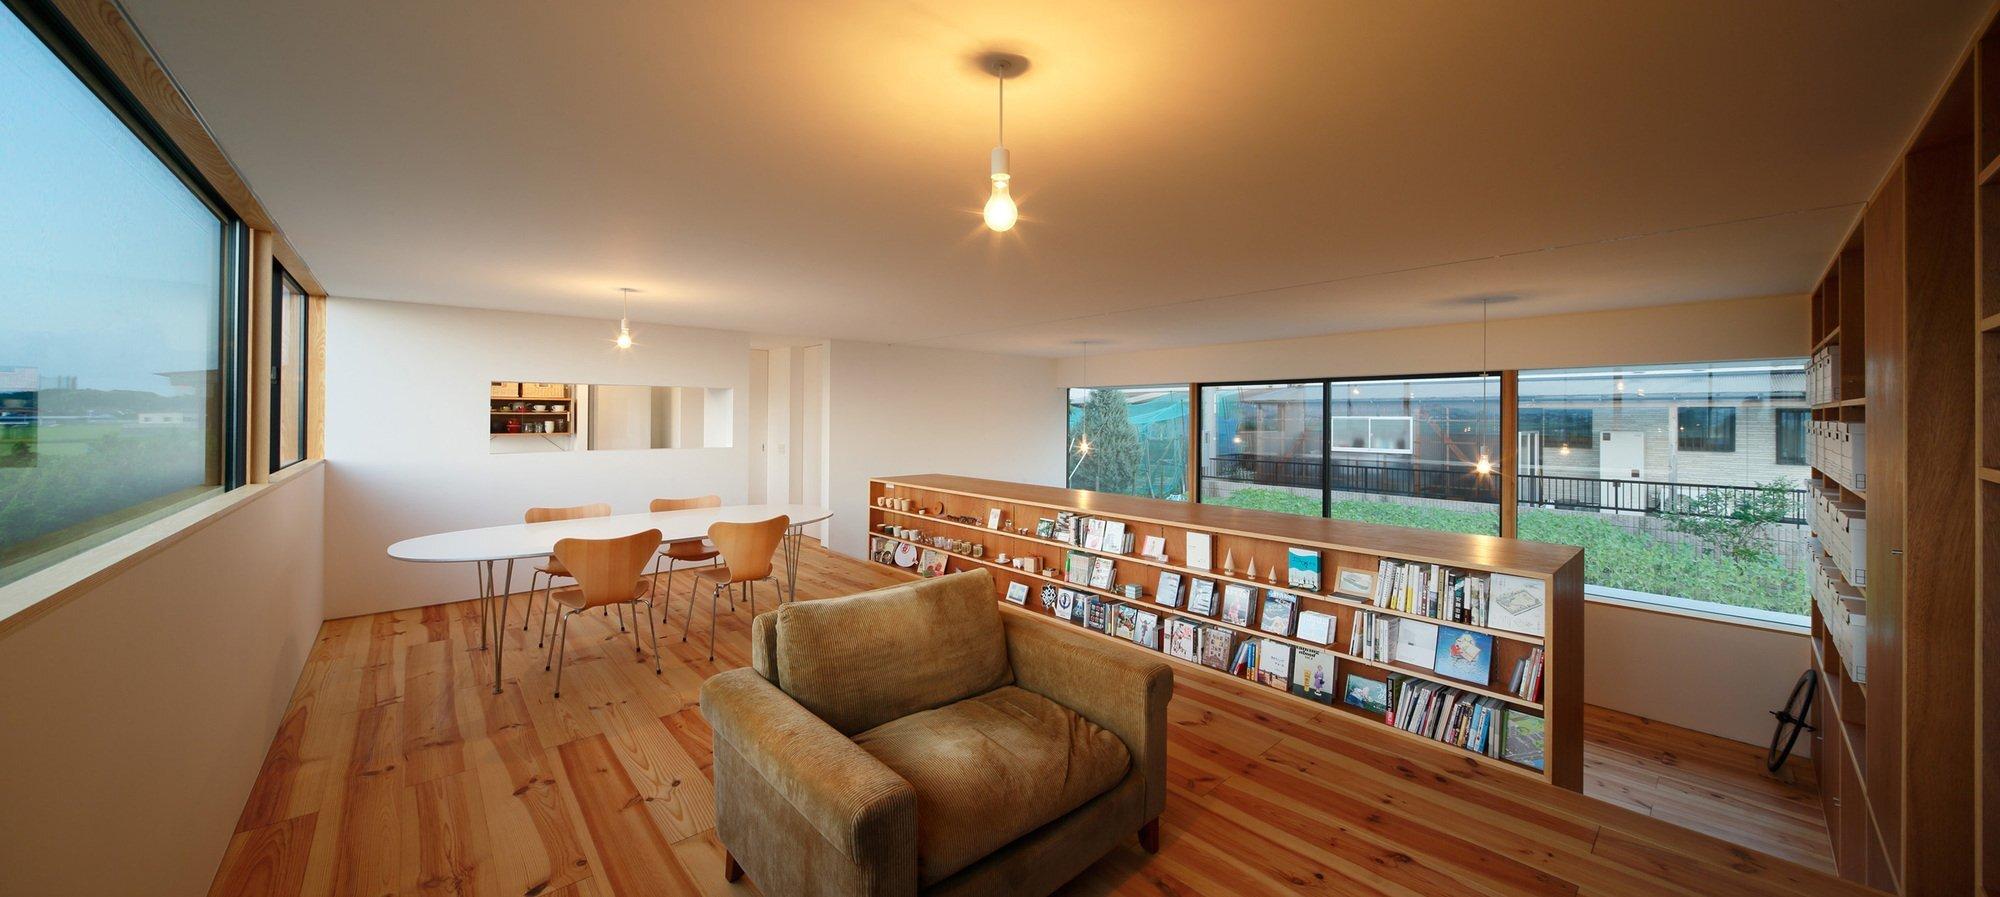 Gui House - Japanese House - Harunatsu-Arch - Shimane Japan - Living Area - Humble Homes